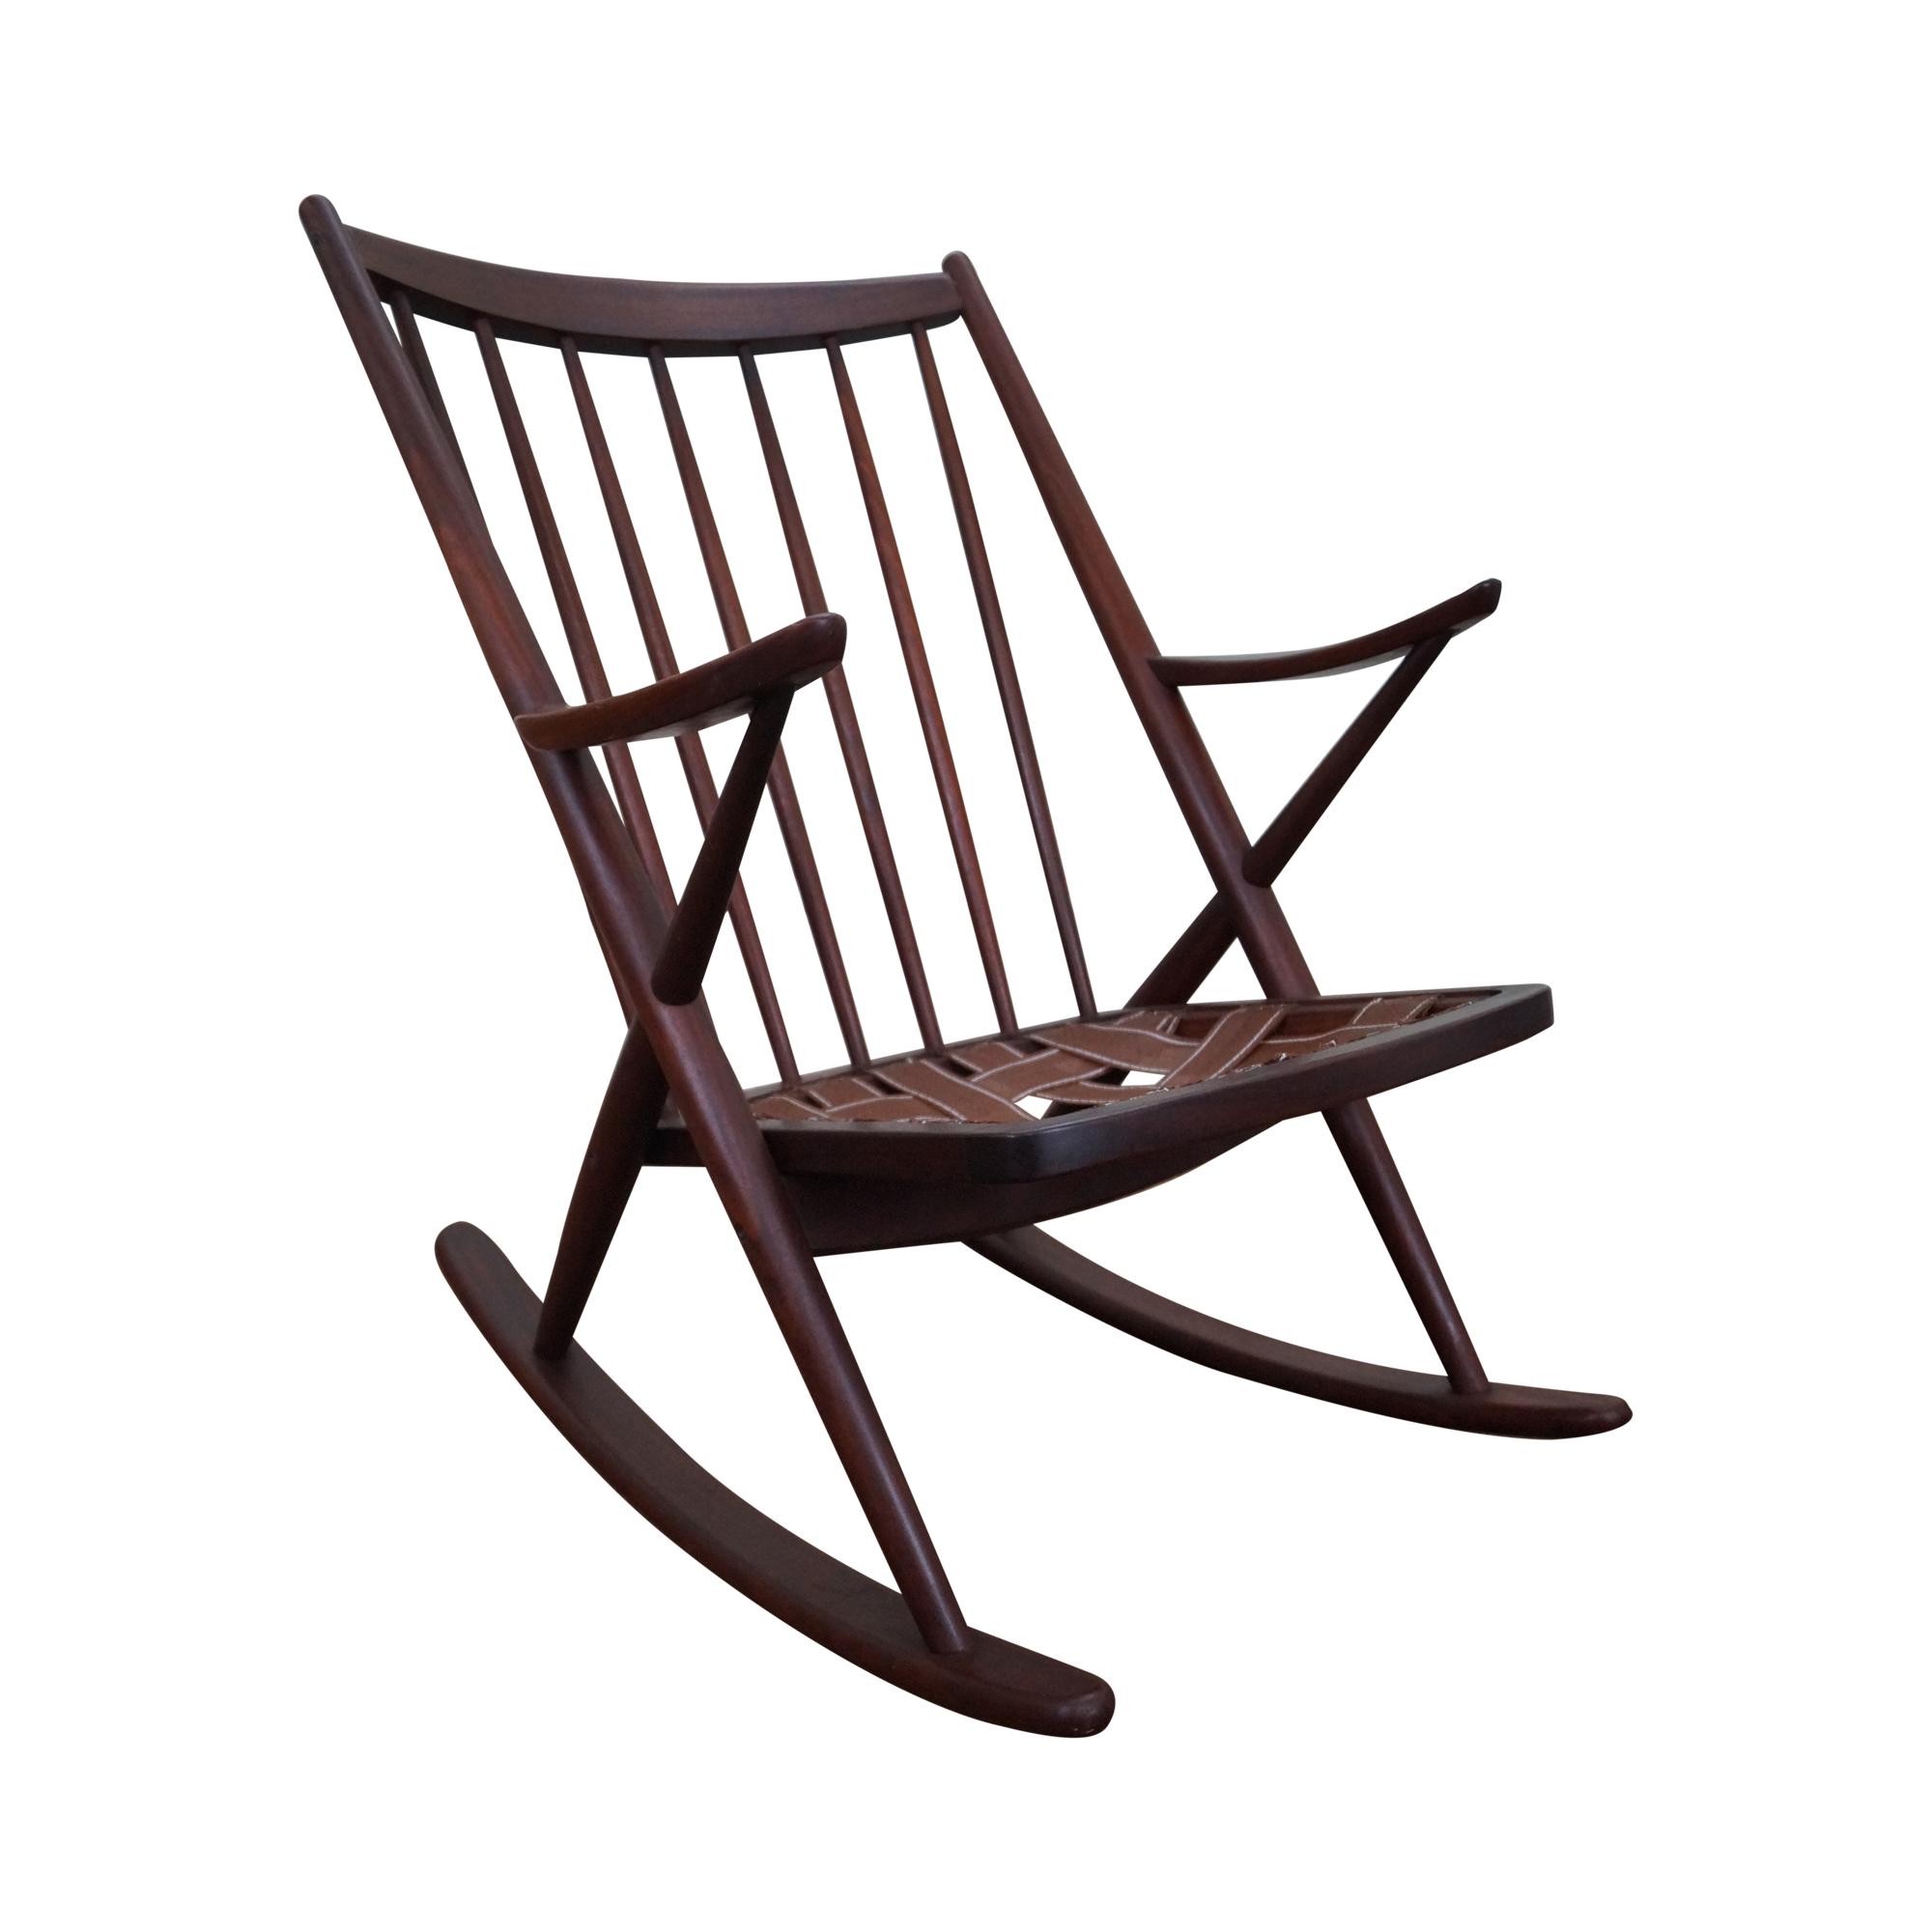 Frank reenskaug rocking chair - Frank Reenskaug Rocking Chair 12